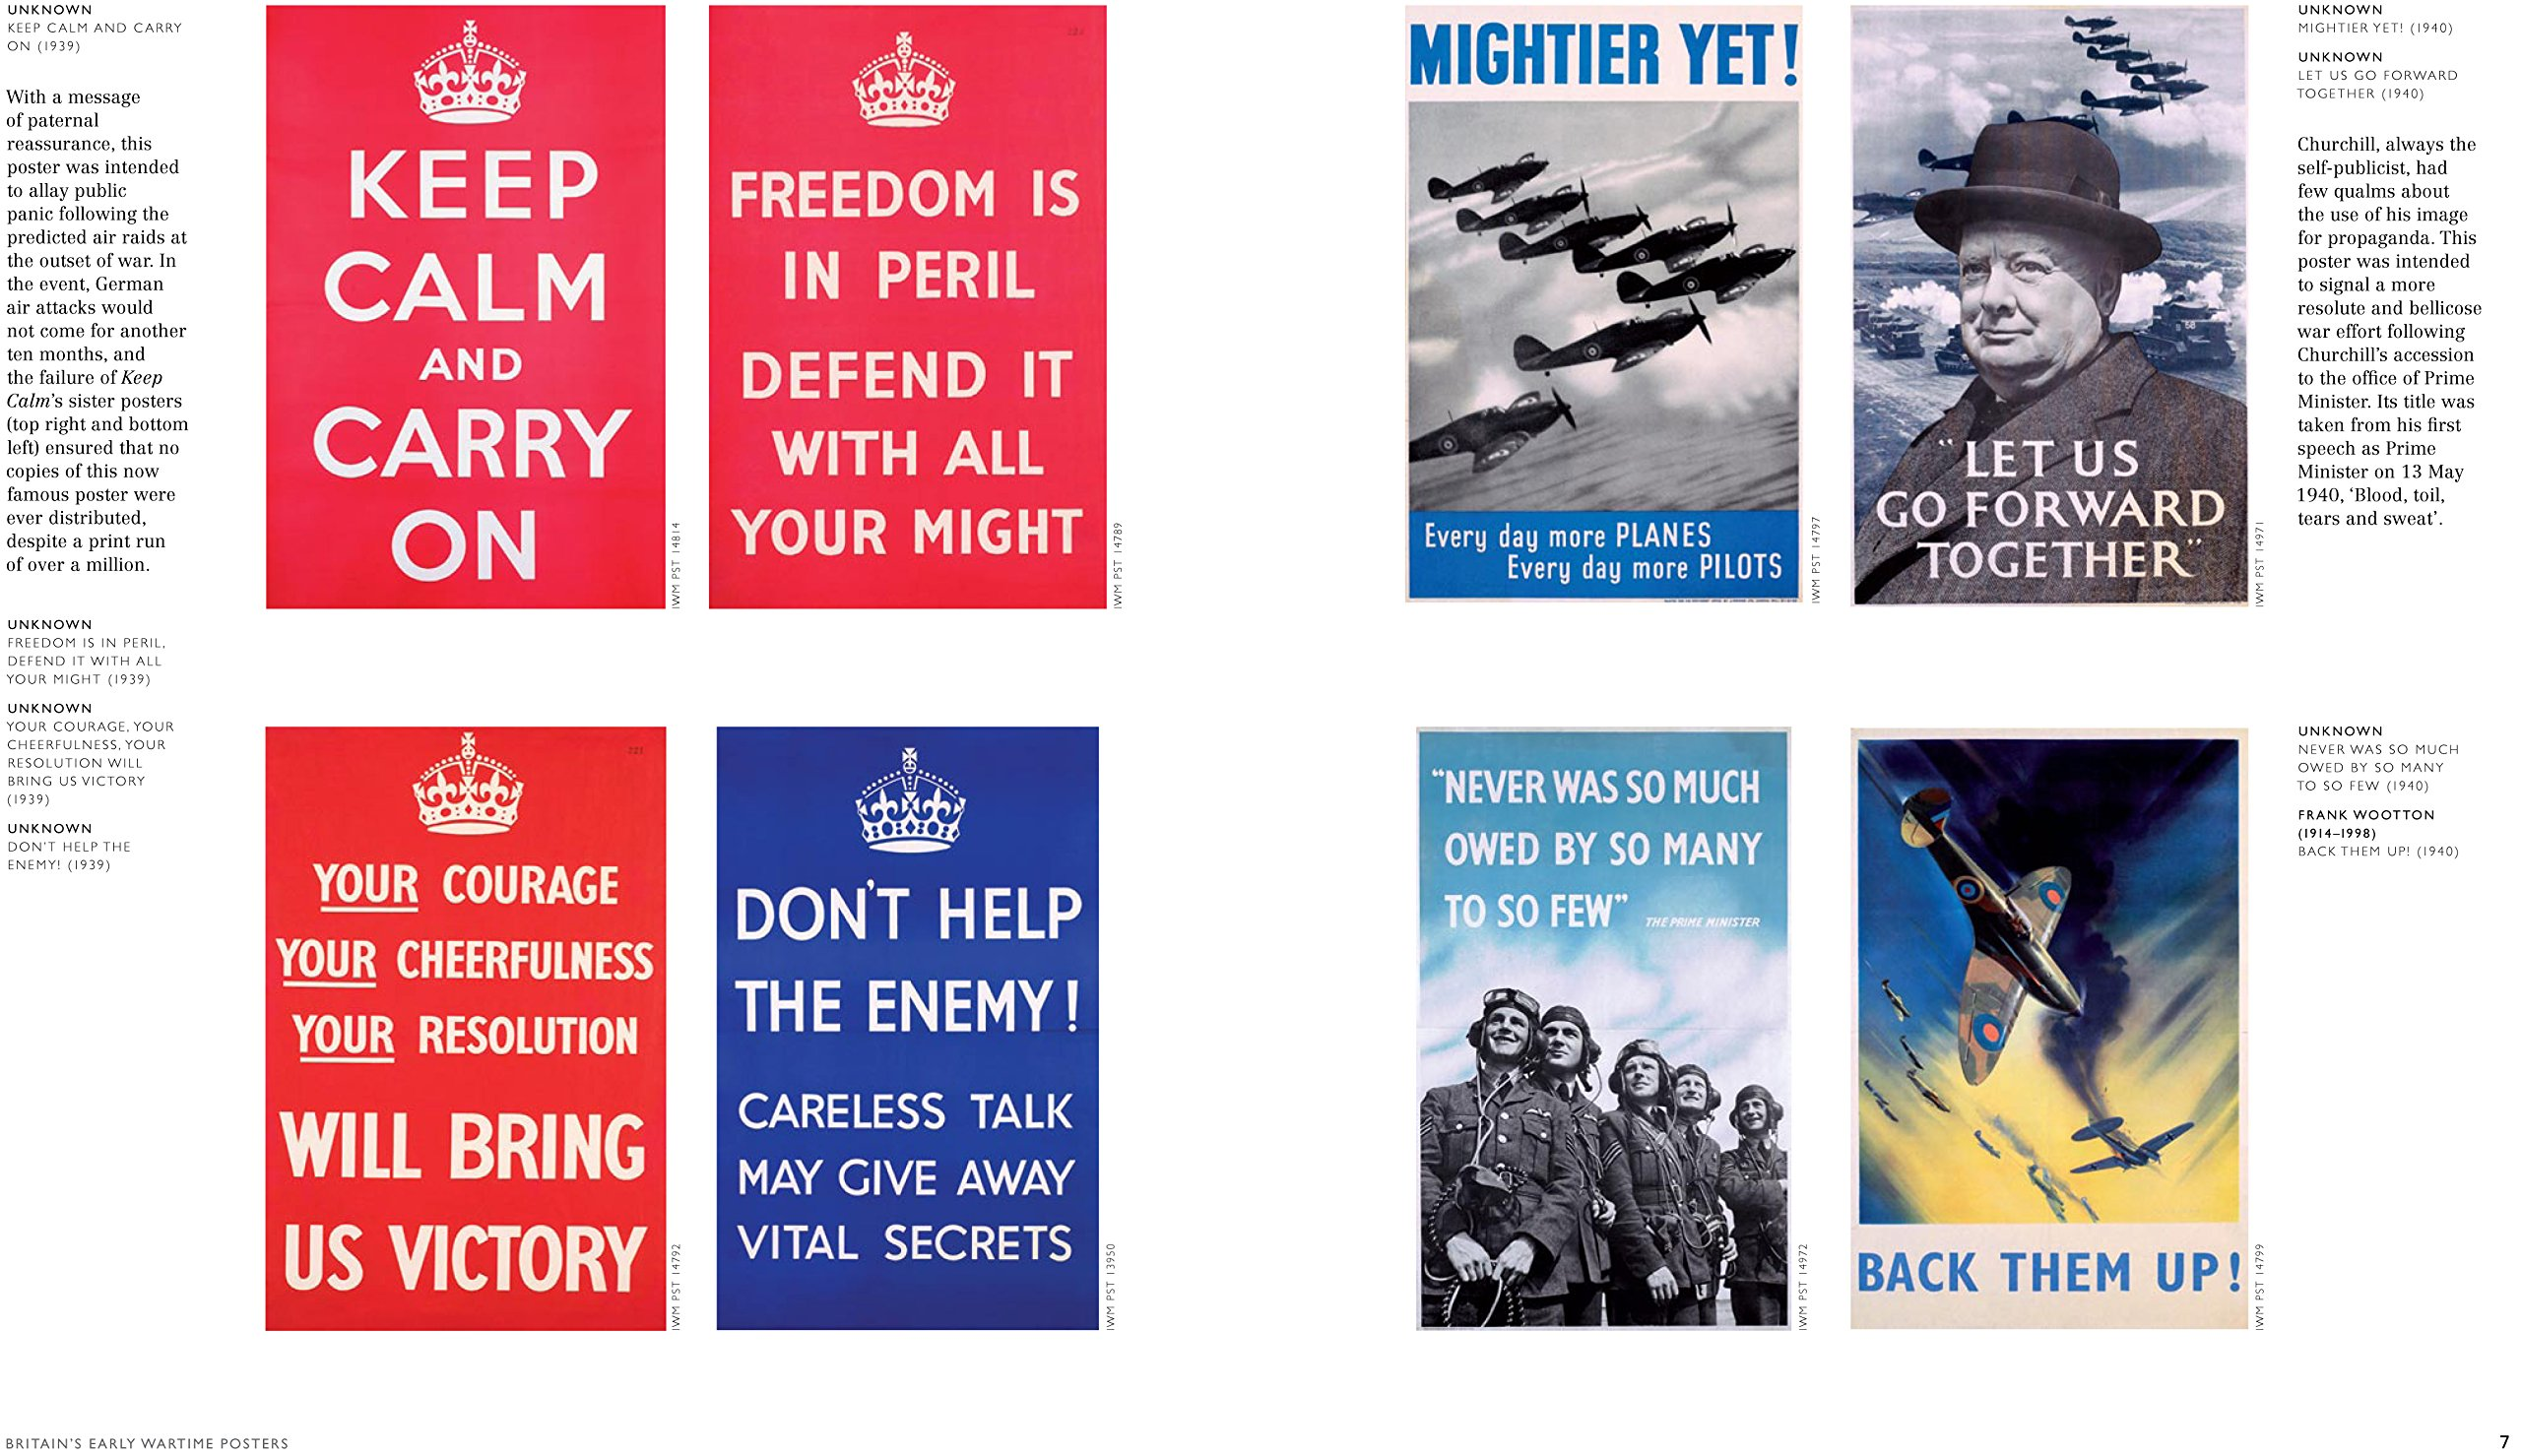 Vintage Freedom Is In Peril World War II Propaganda Poster Art Print A4